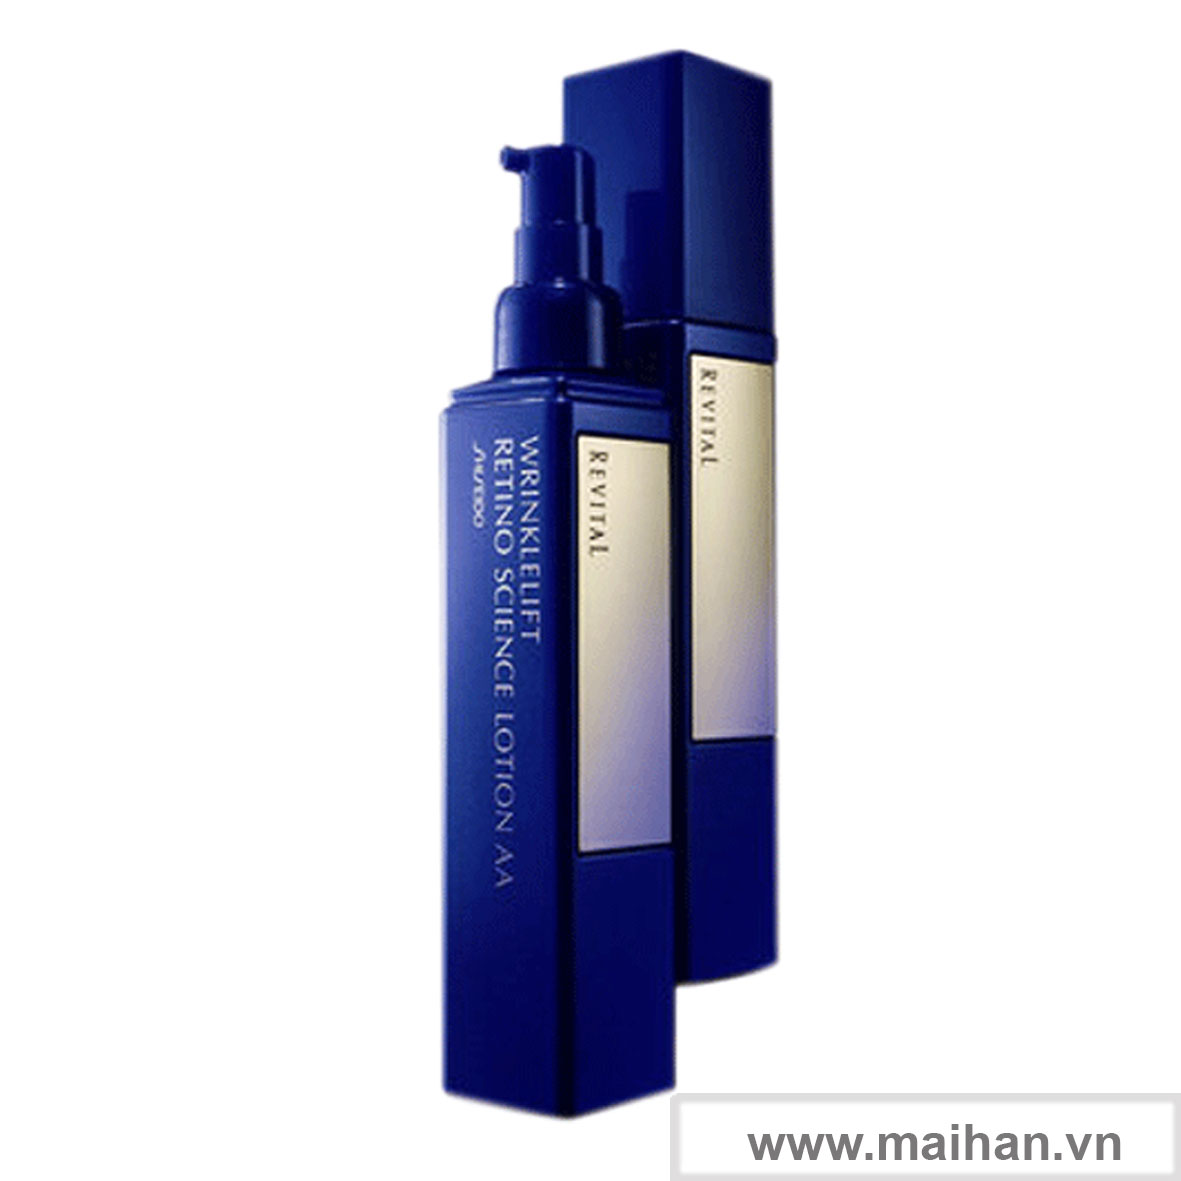 Kem chống nhăn Shiseido Revital Wrinklelift Retino Science Lotion AA